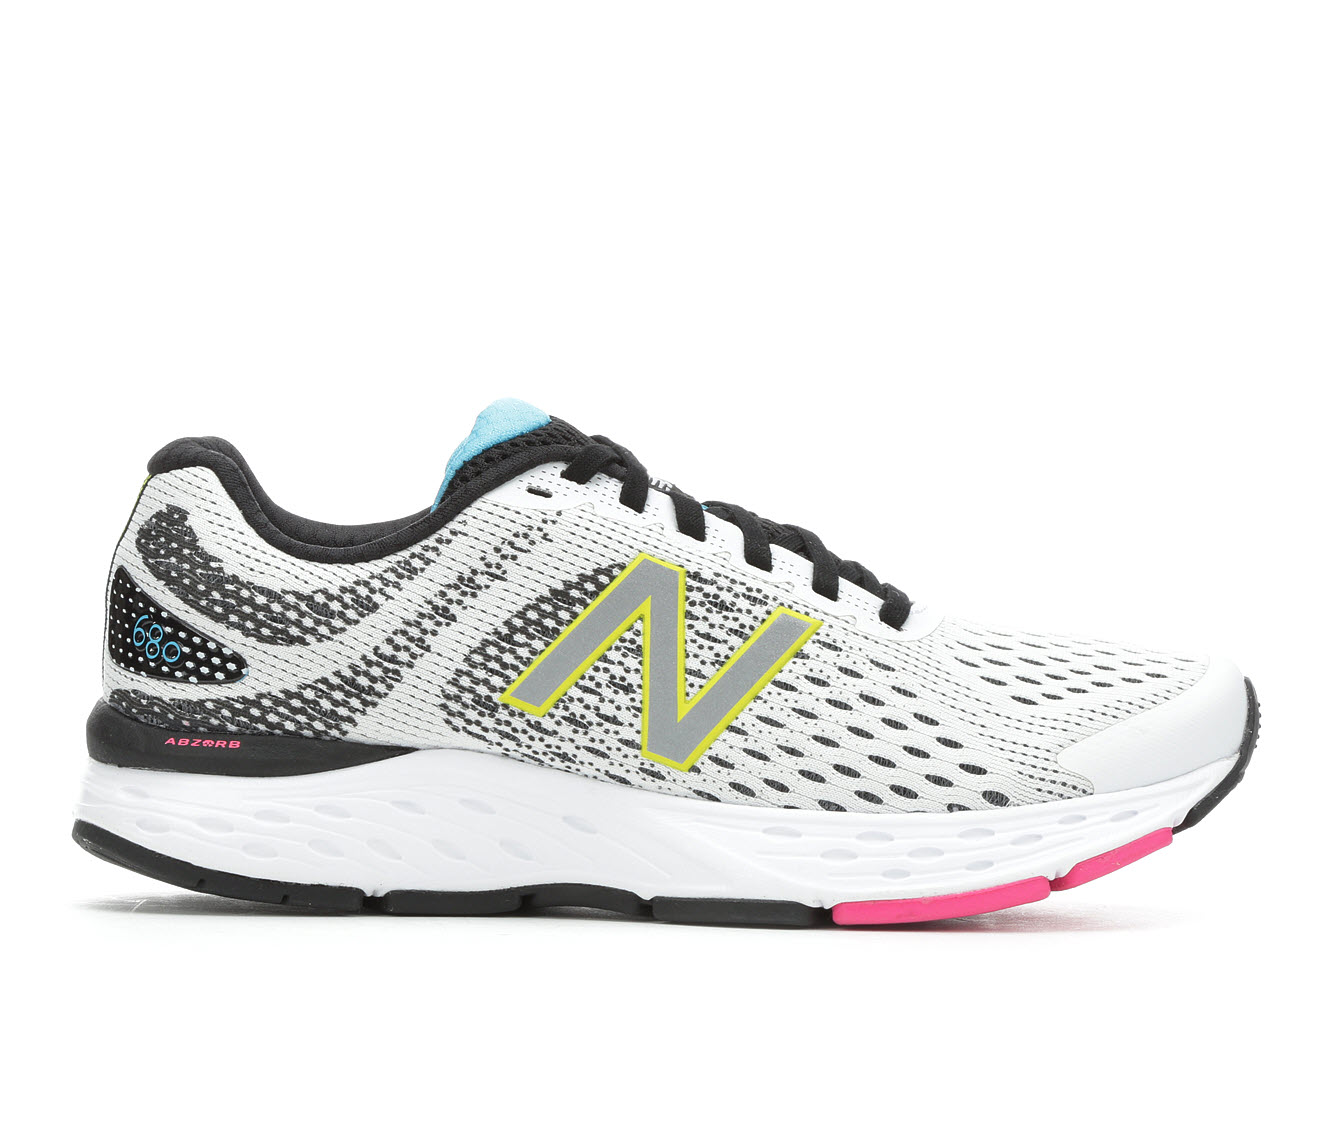 New Balance W680v6 Women's Athletic Shoe (White)